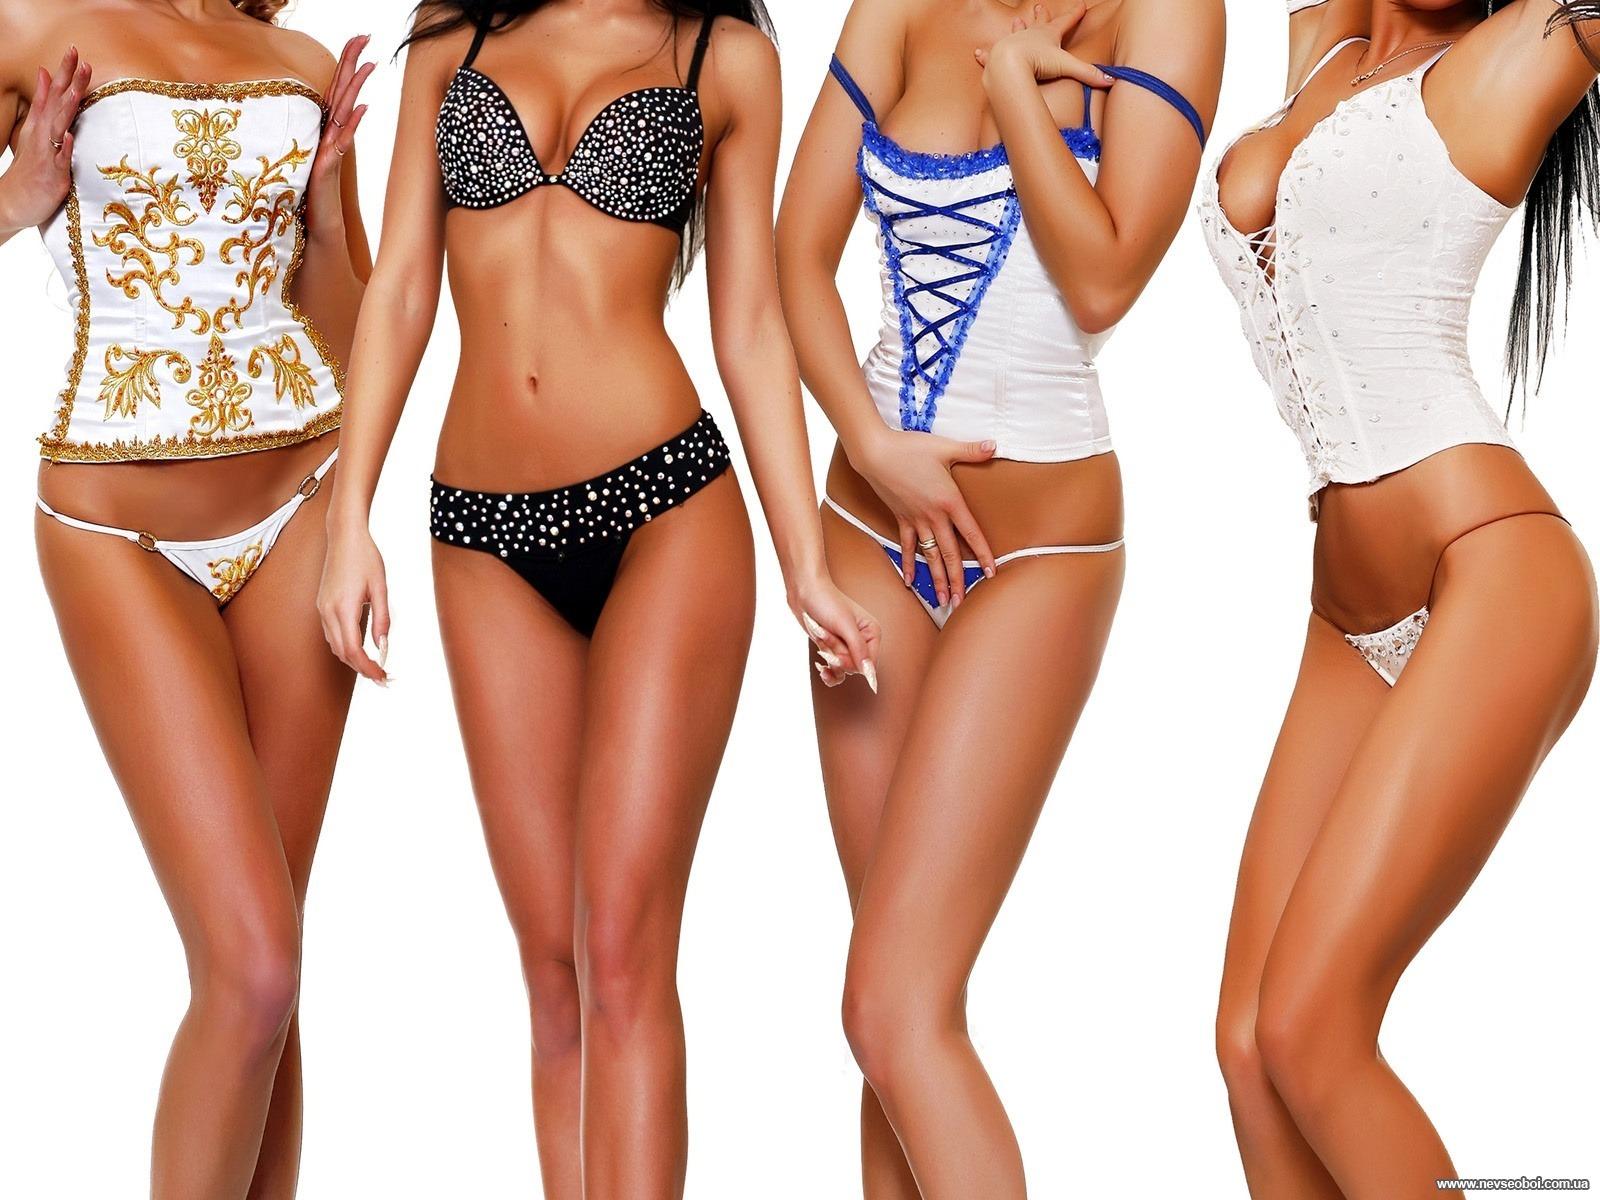 ... обои, фото красивые тела картинки: www.wallplanet.ru/photo/devushki/zagorelye_devushki/2-0-11837